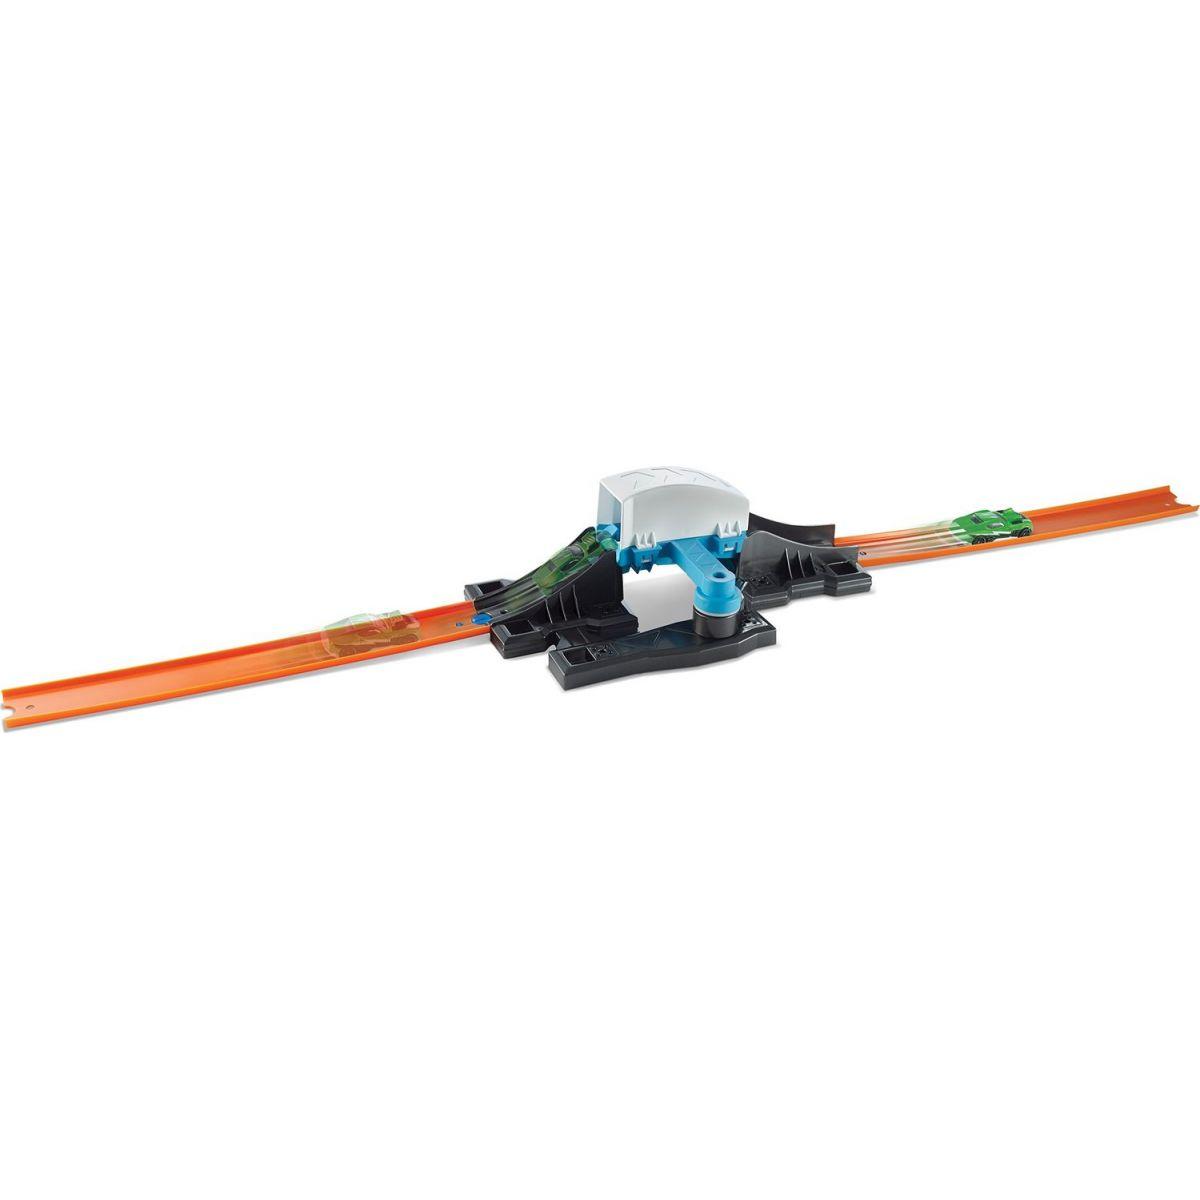 Hot Wheels Track builder doplňky a dráhy - DNB70 Spin Launch